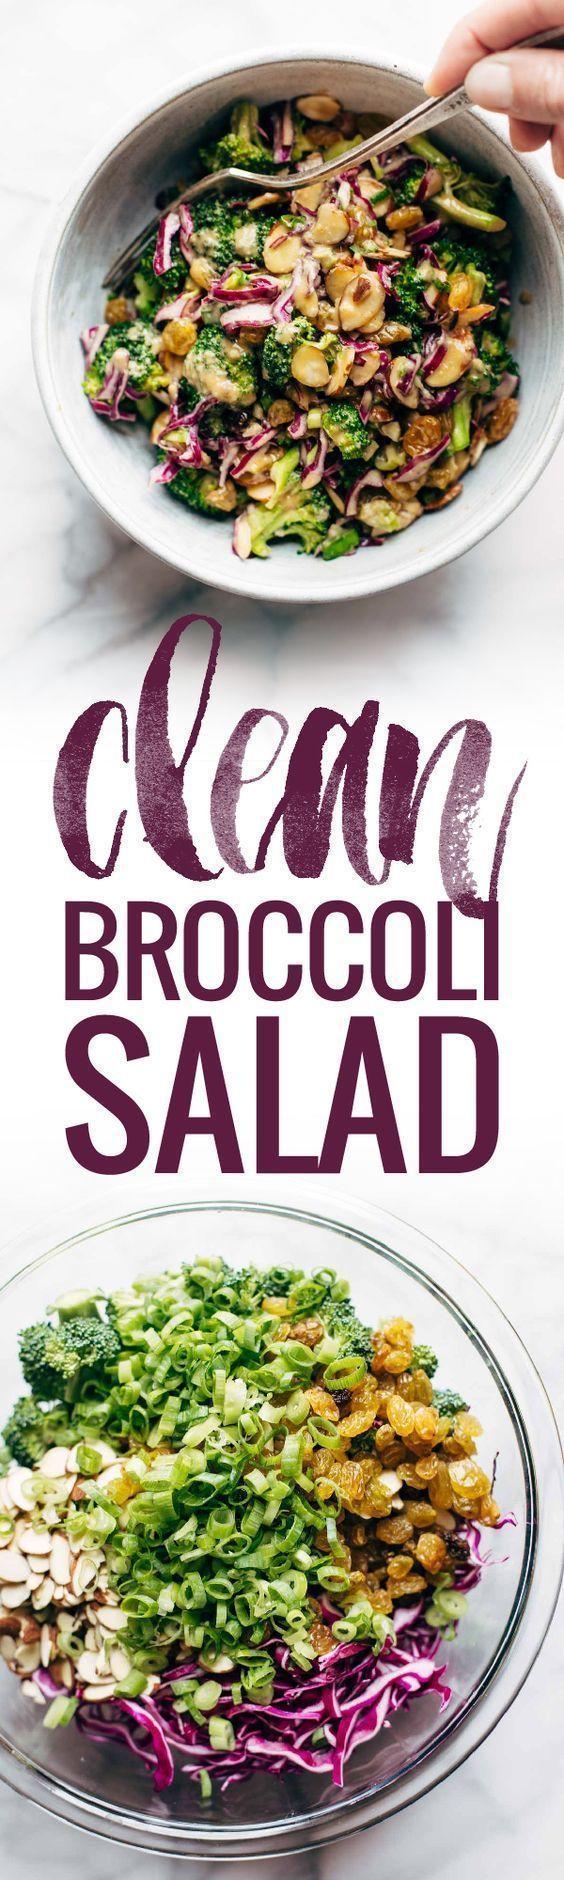 Clean Broccoli Salad with Creamy Almond Dressing – Best Vegan Life